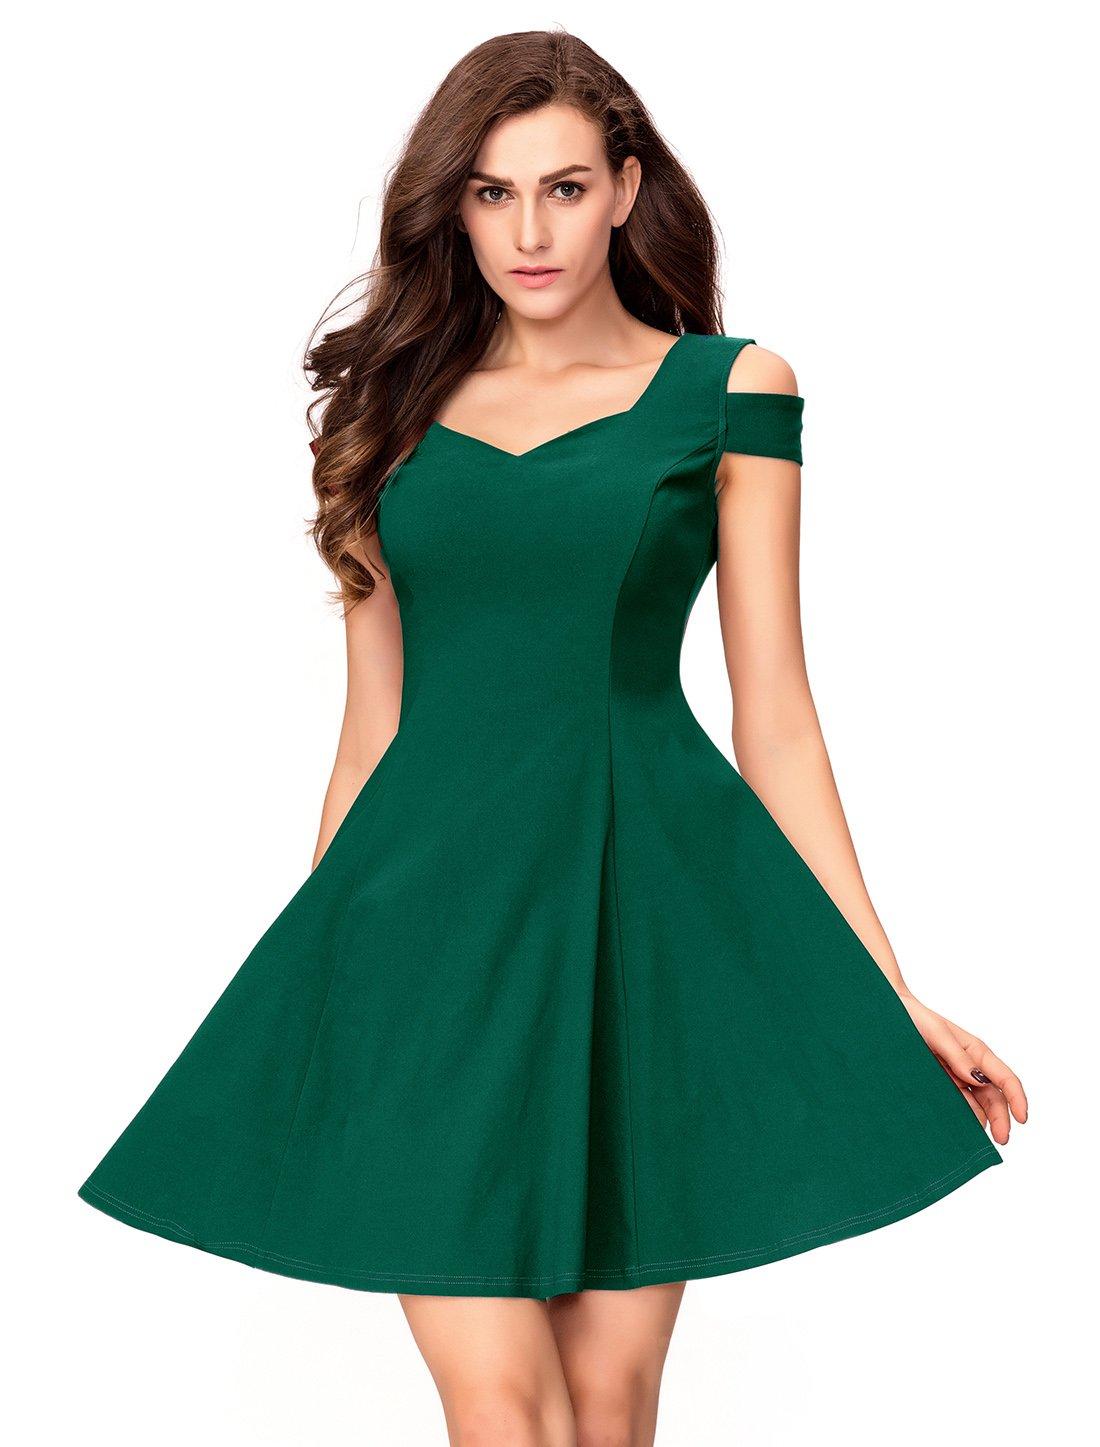 InsNova Cocktail Dresses for Women's Green Off Shoulder Simple Dress xS